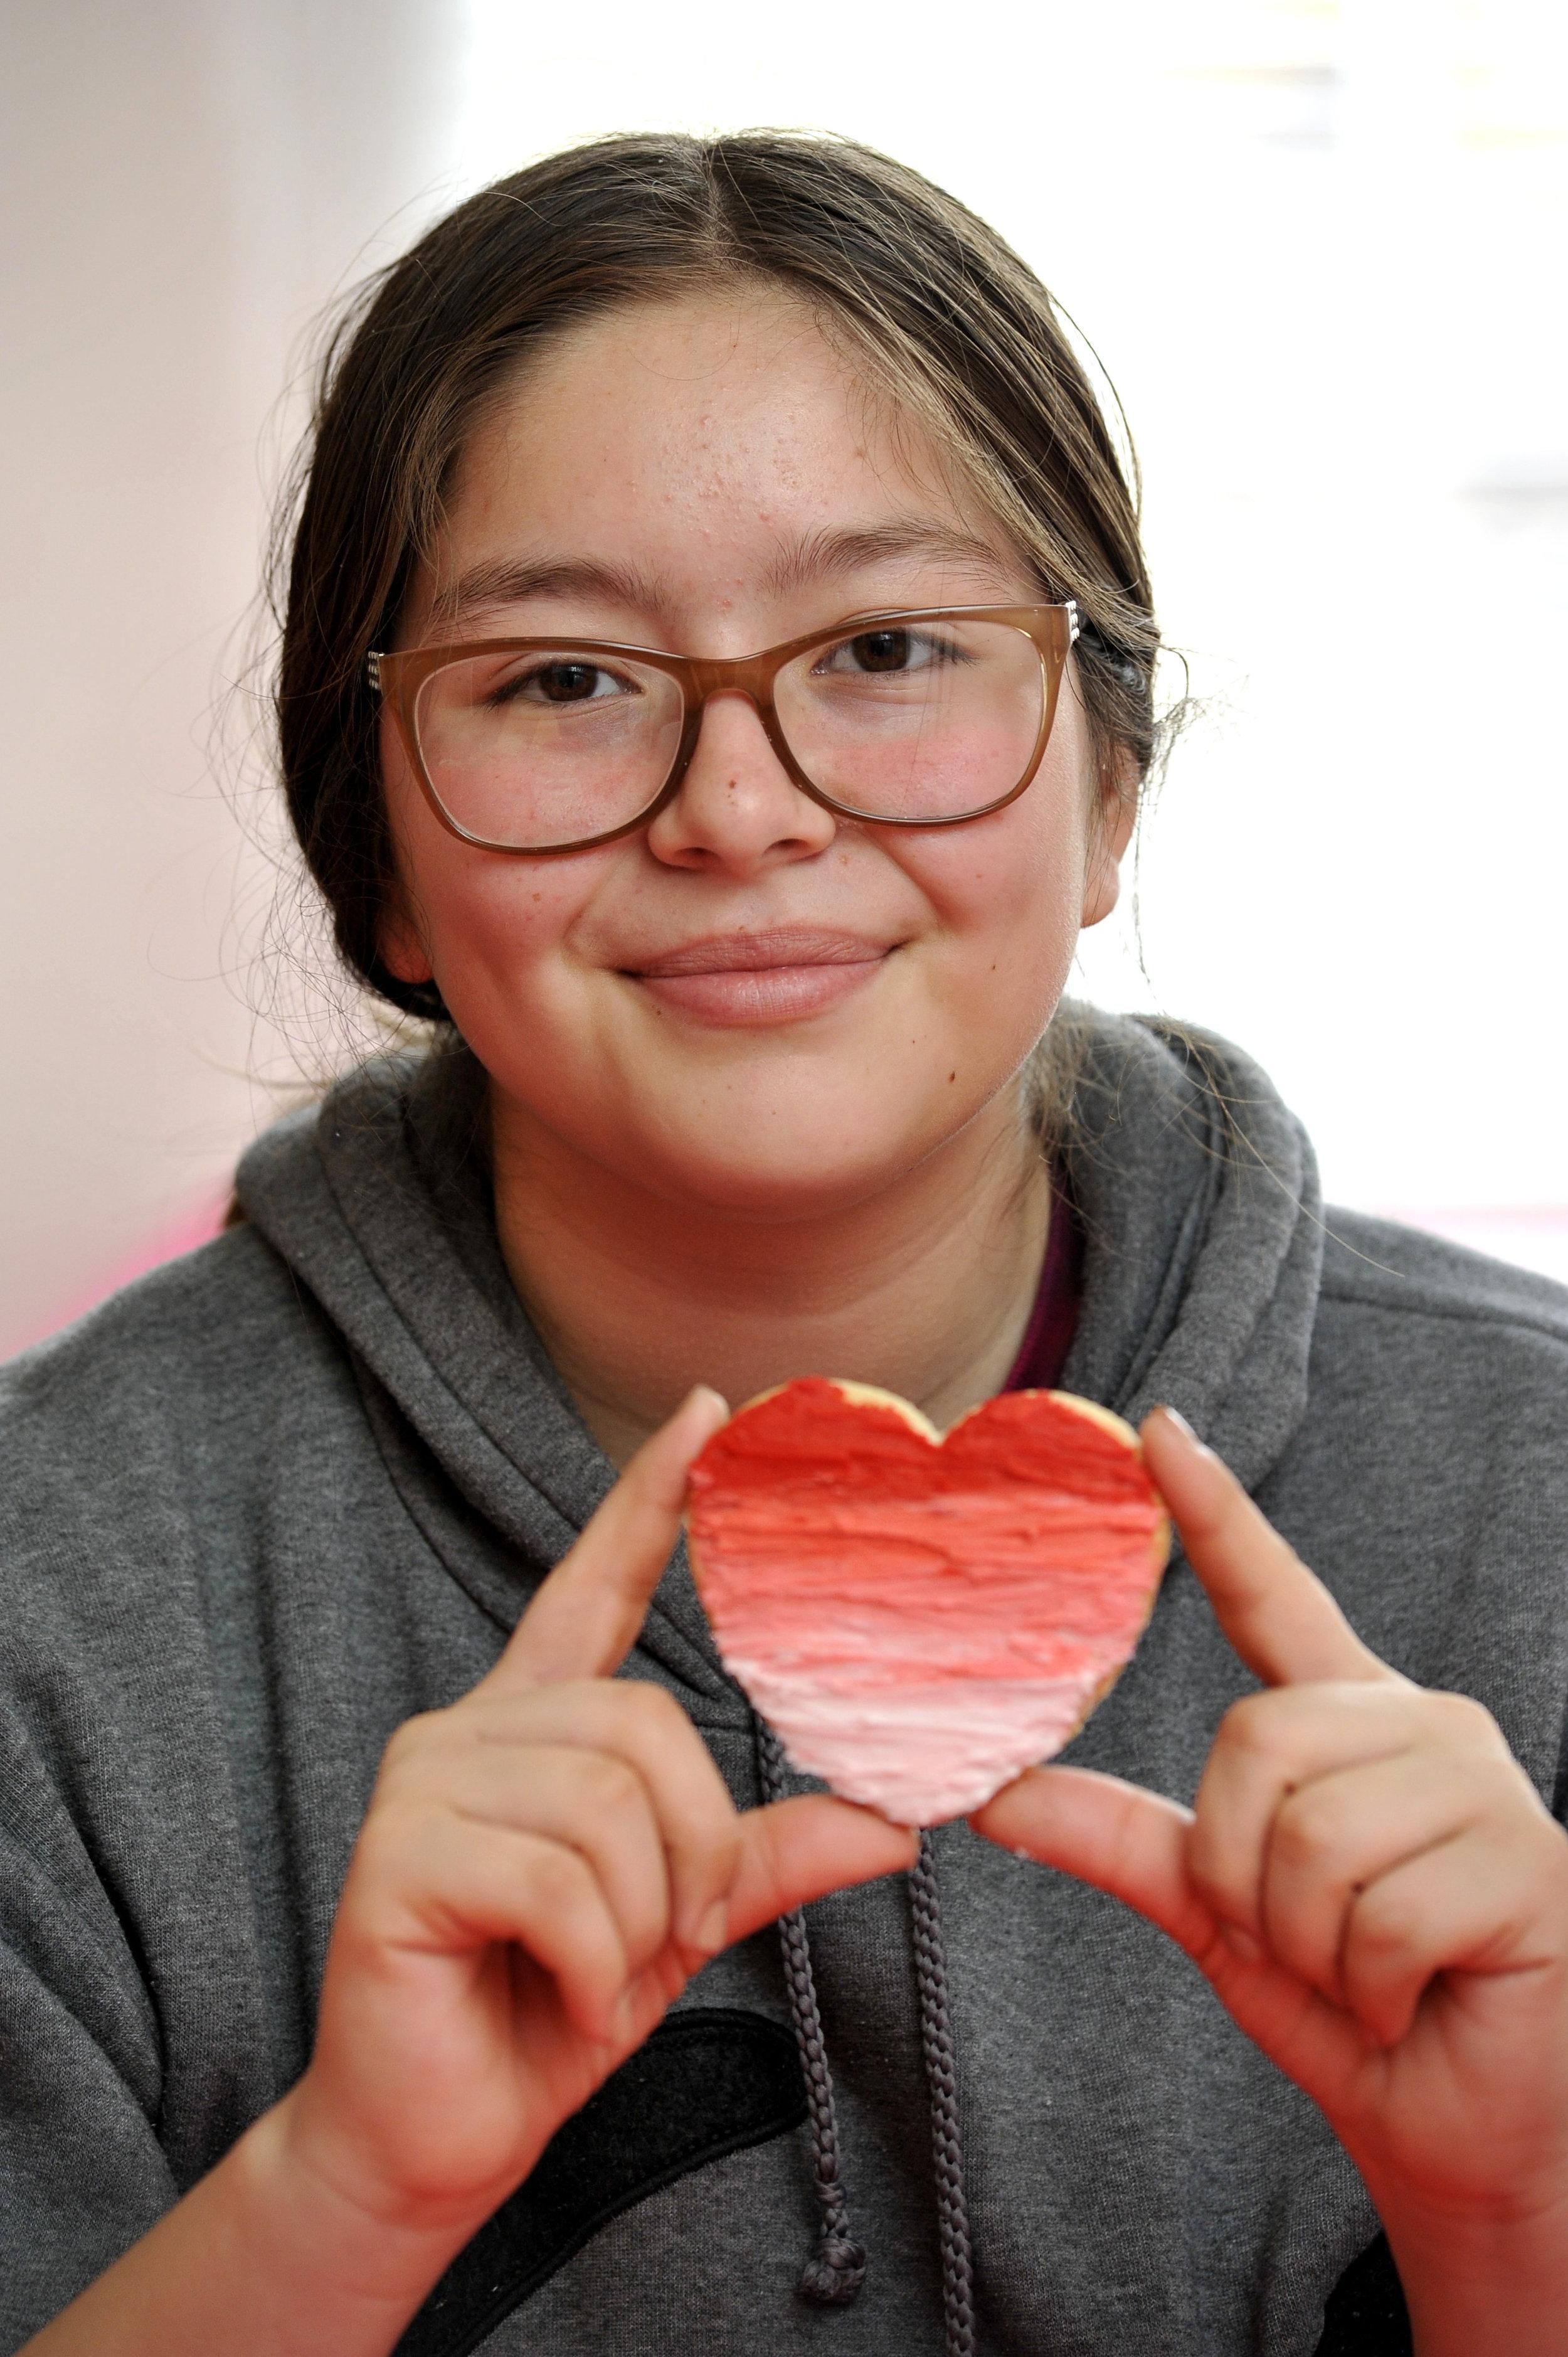 Girl heart cookie.JPG